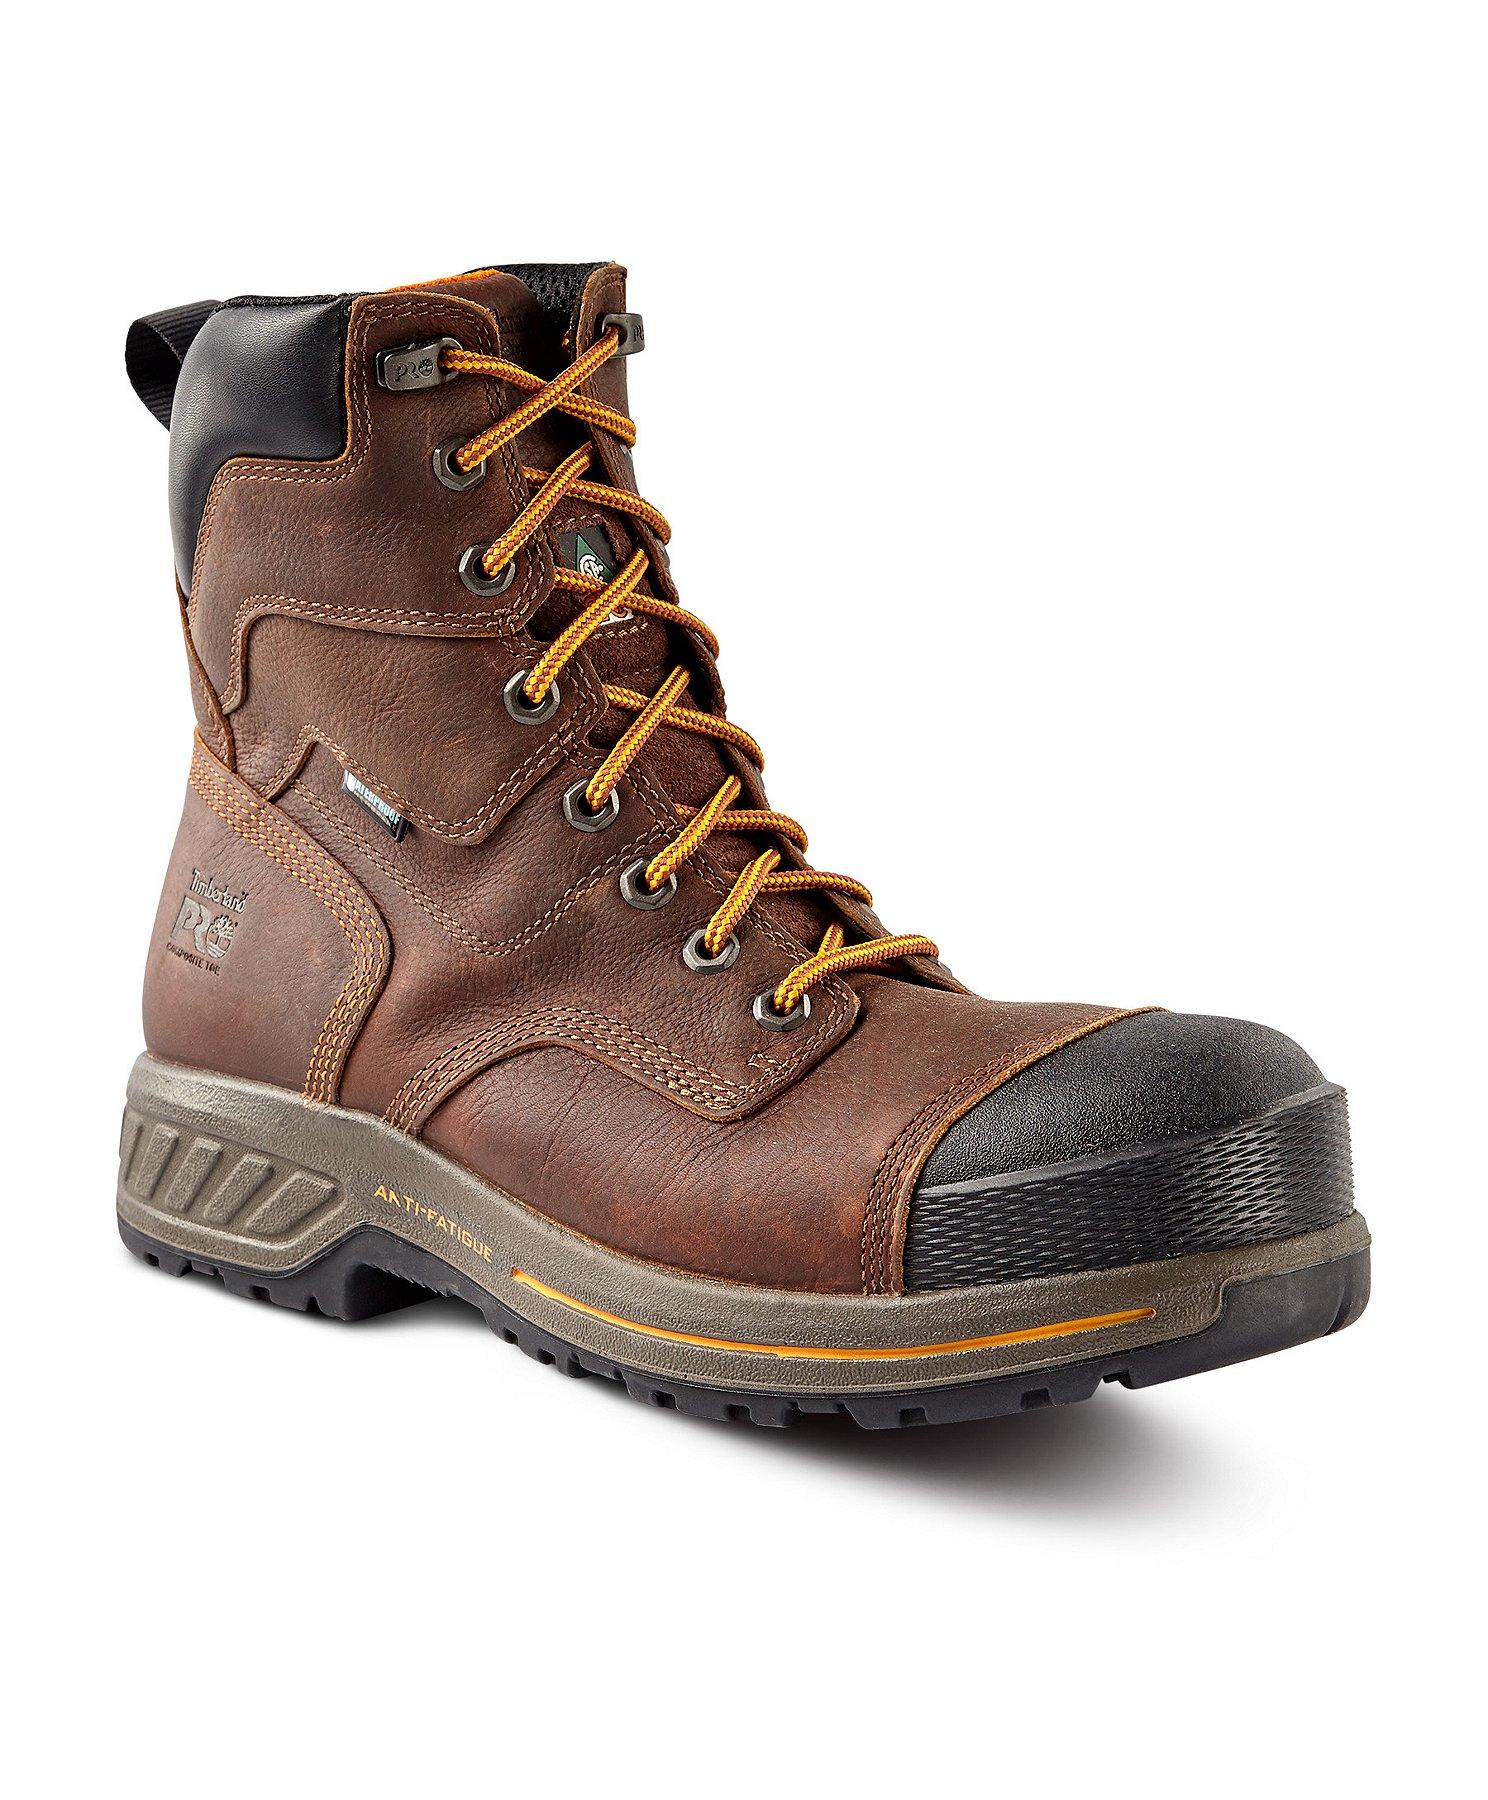 etiqueta Afirmar almohadilla  Men's Pro Endurance HD 8 In Composite Toe Composite Plate Work Boots |  Mark's